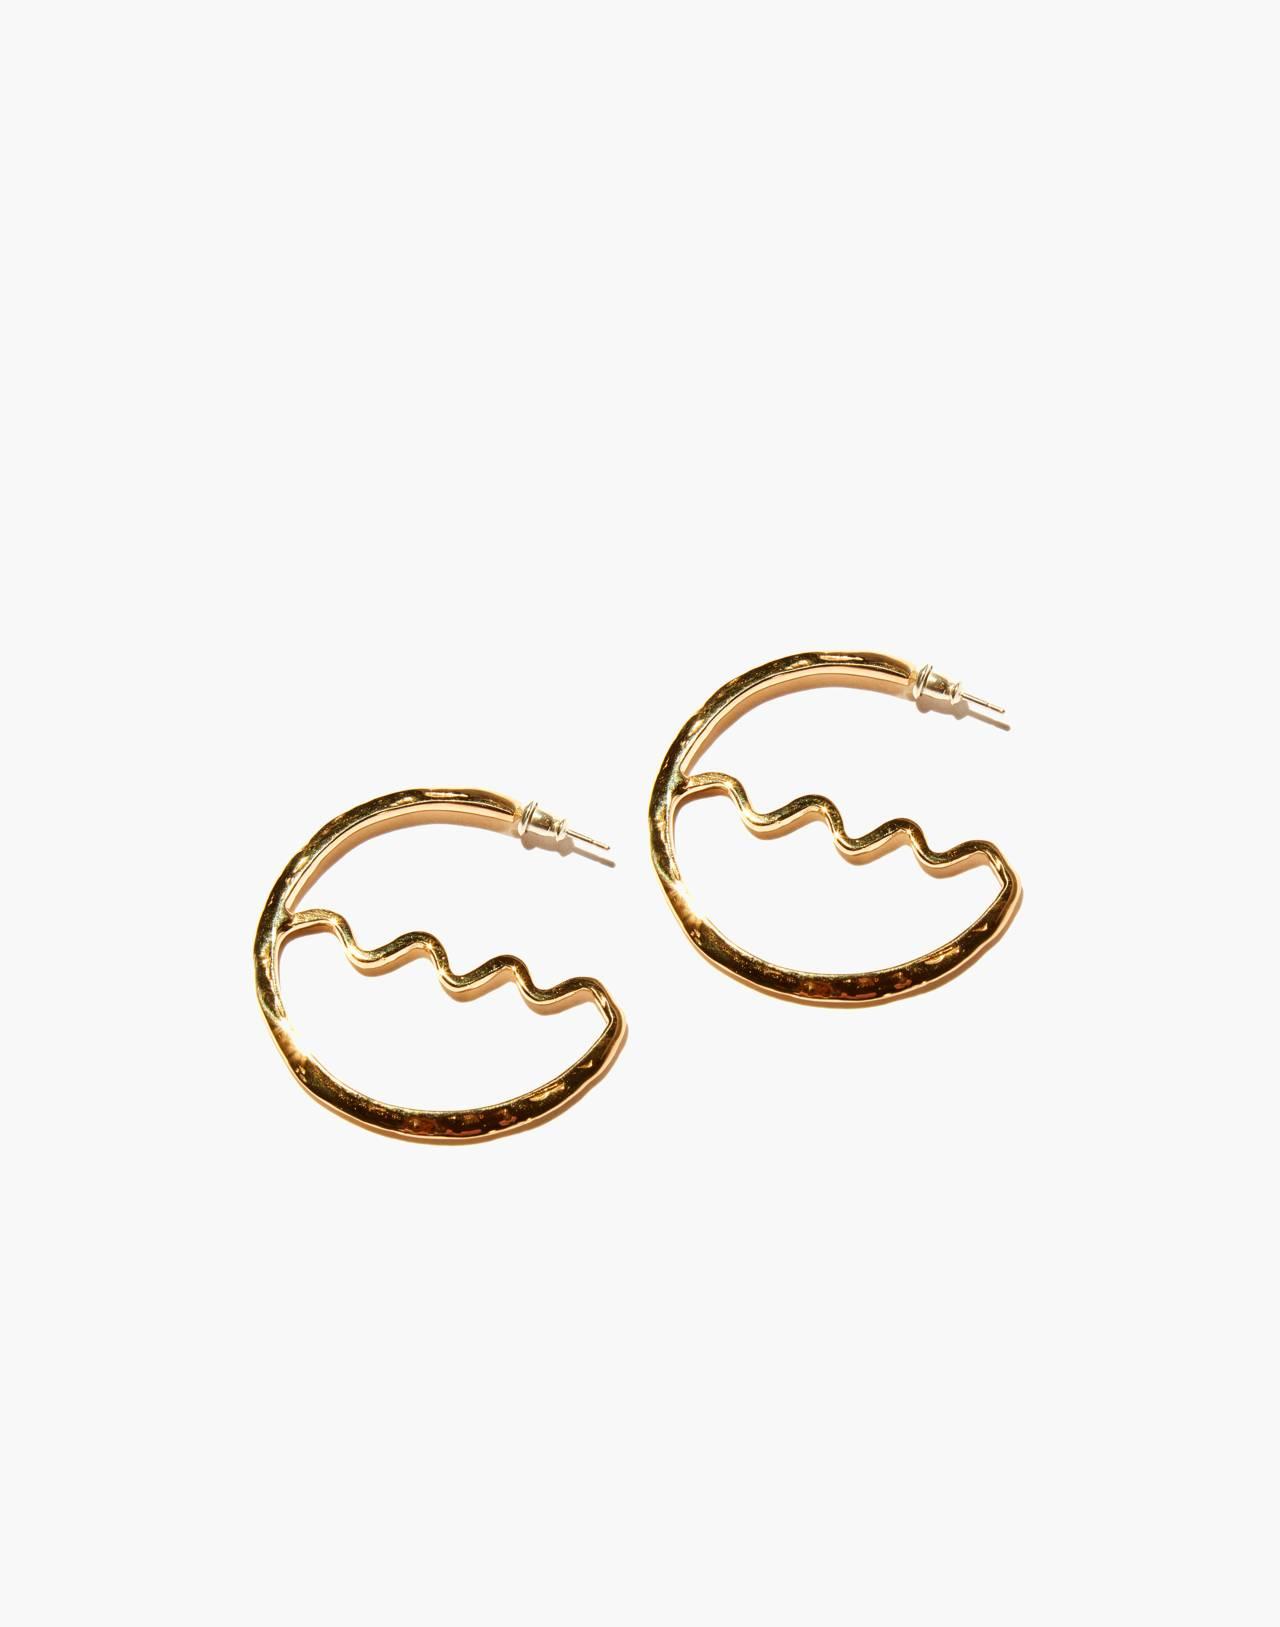 Odette New York® Cygne Earrings in gold image 1